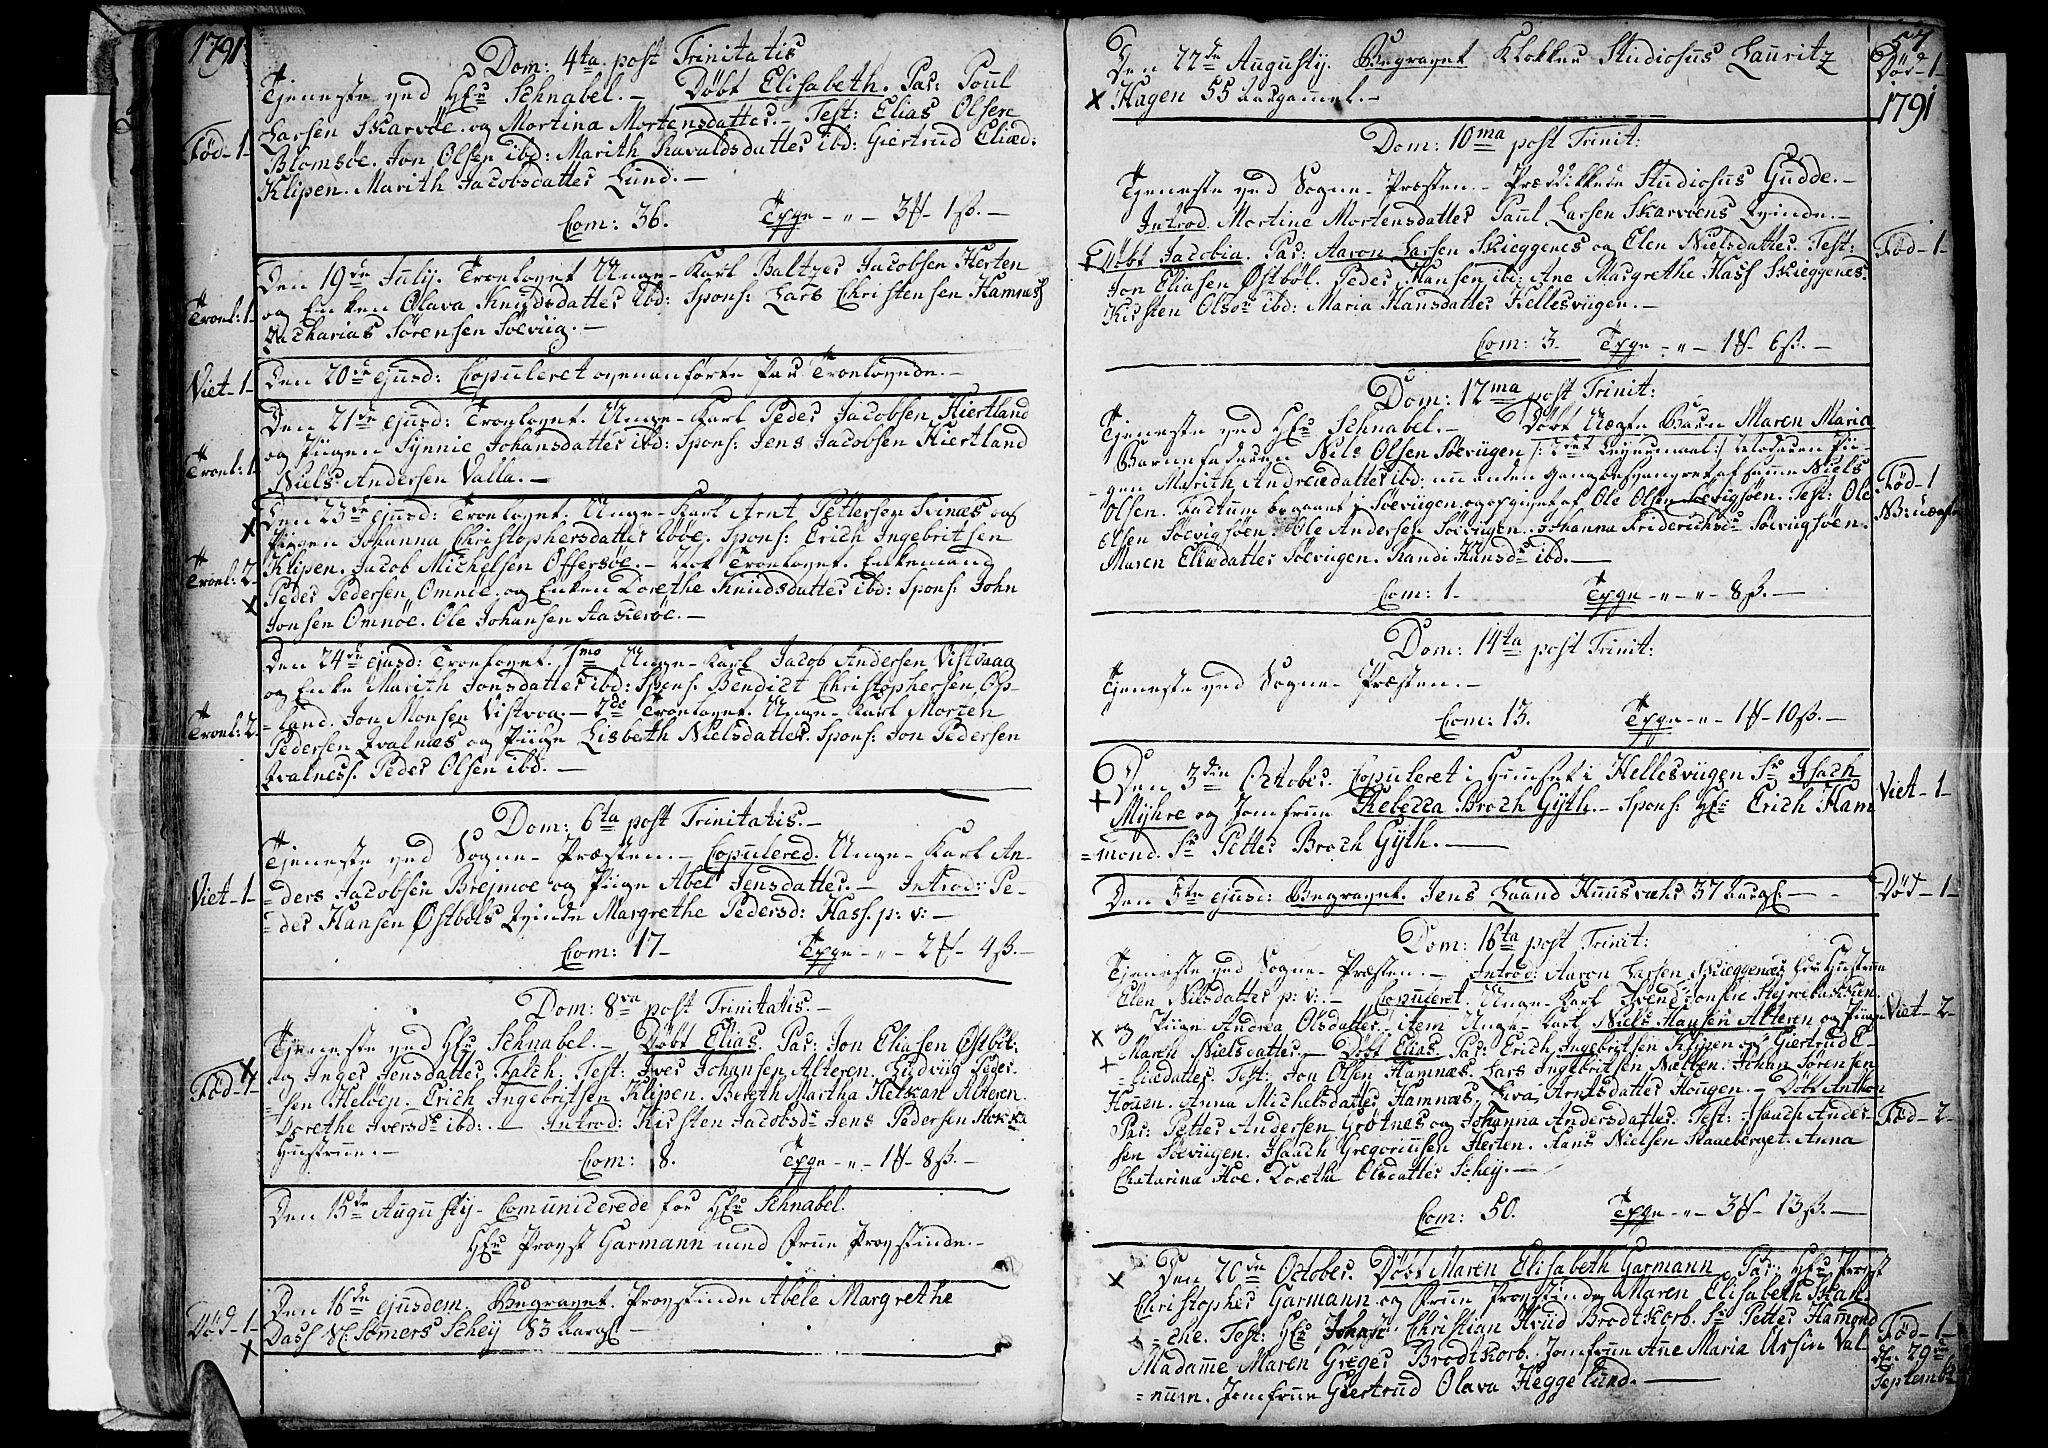 SAT, Ministerialprotokoller, klokkerbøker og fødselsregistre - Nordland, 830/L0439: Ministerialbok nr. 830A07 /1, 1776-1800, s. 57